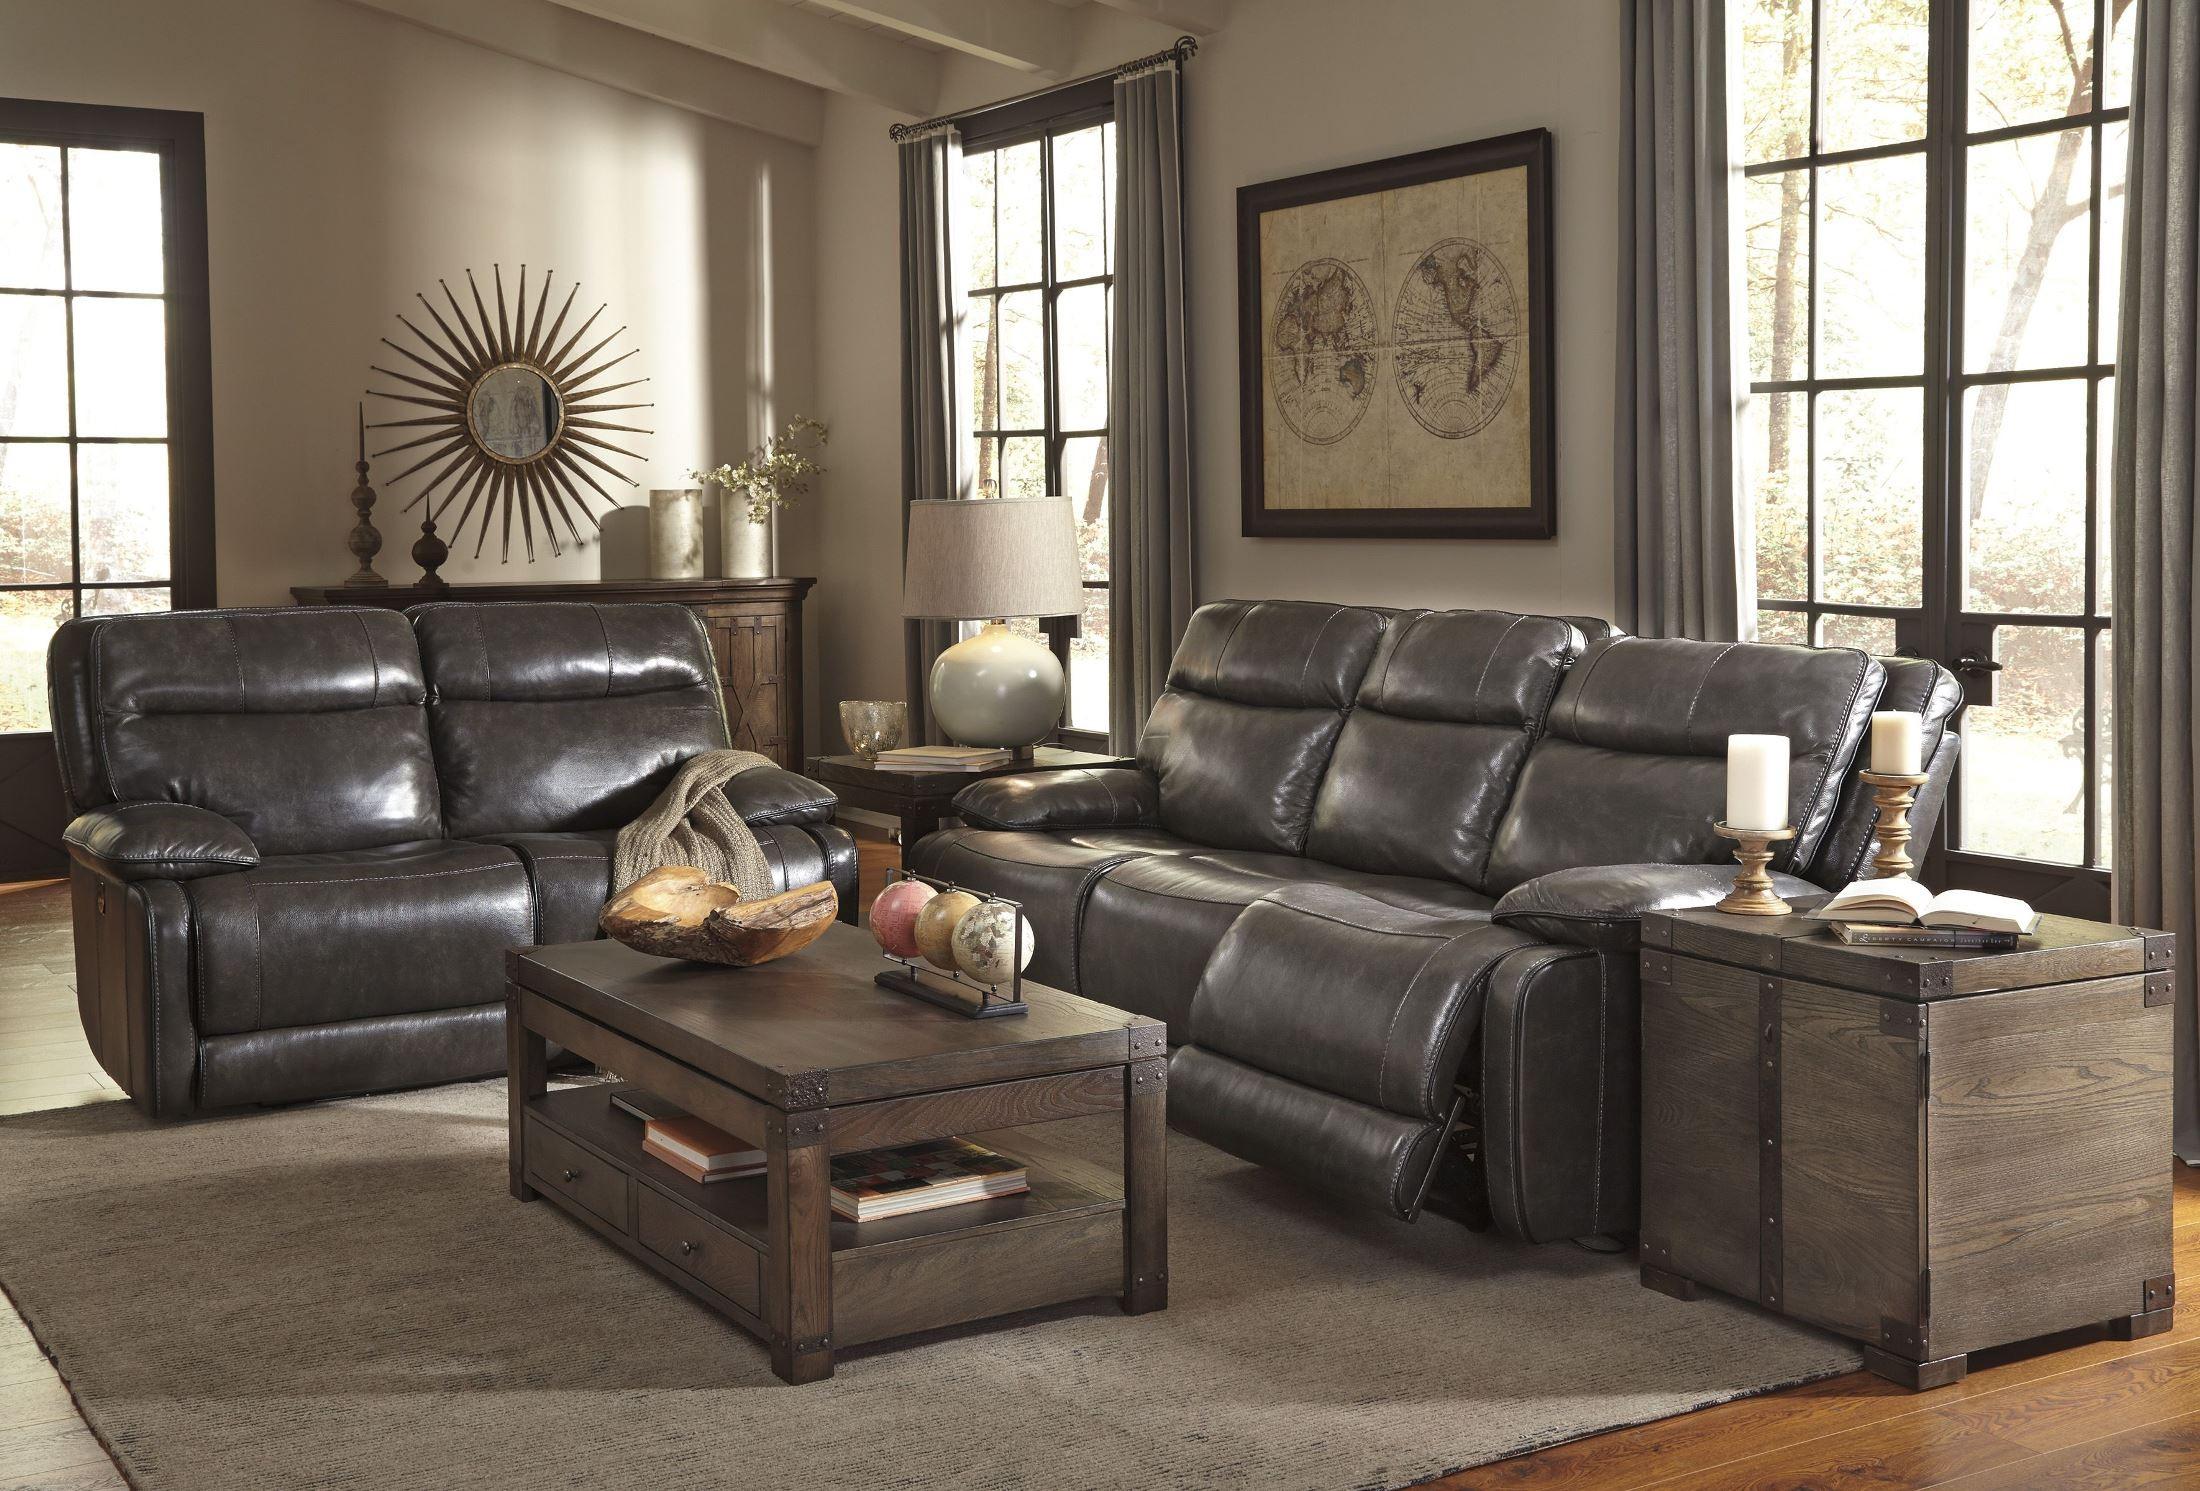 Palladum Metal Power Reclining Living Room Set From Ashley (U7260187) |  Coleman Furniture